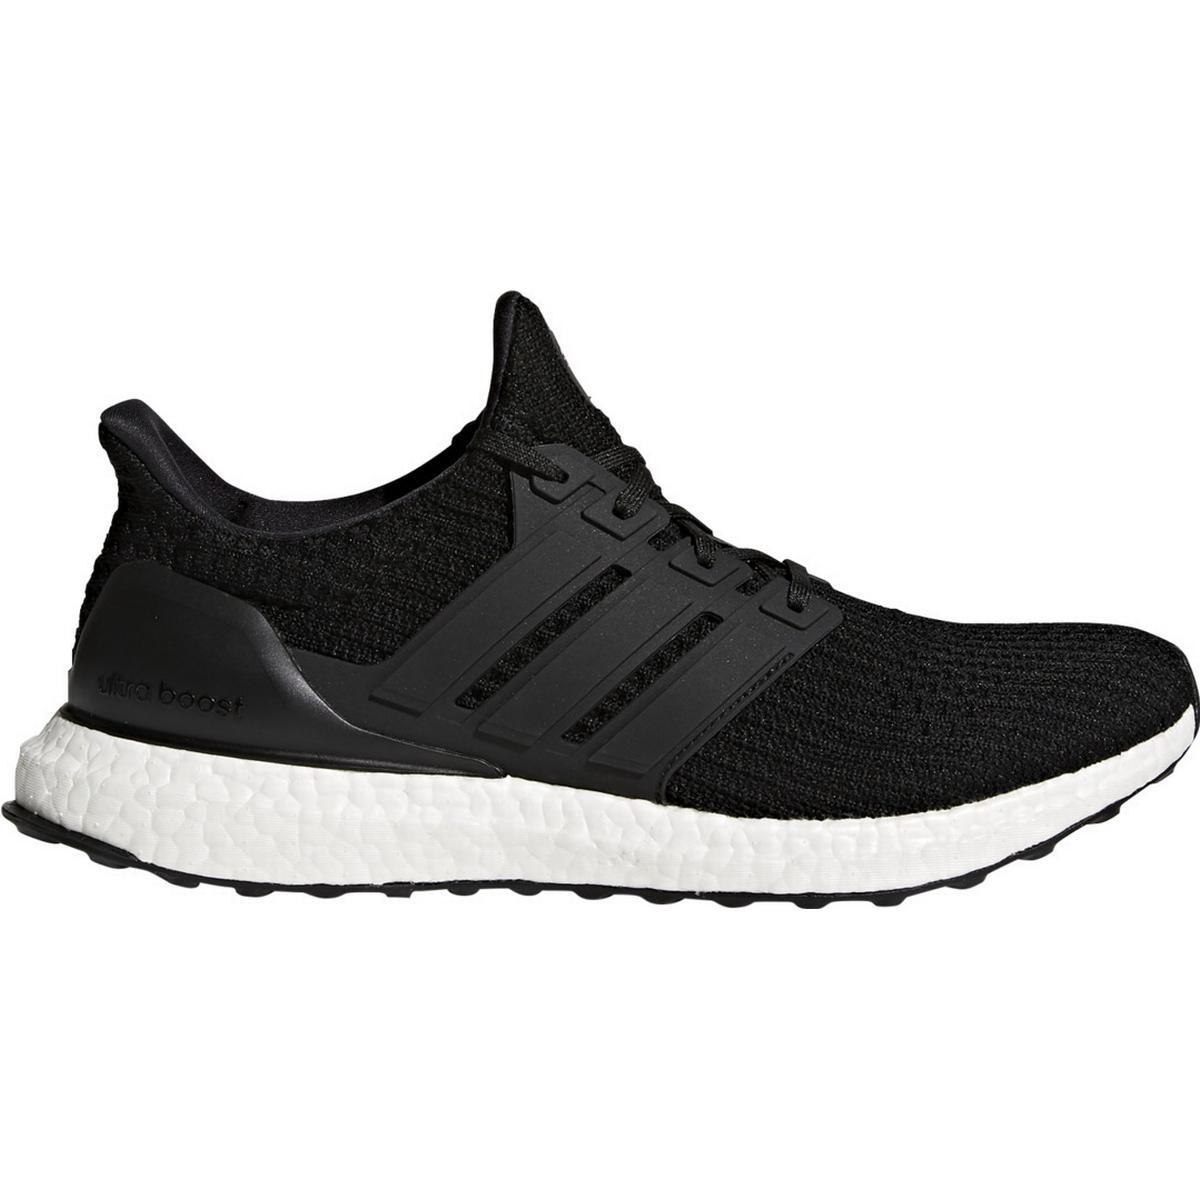 Adidas Yeezy Boost 350 V2 Ultra Boost